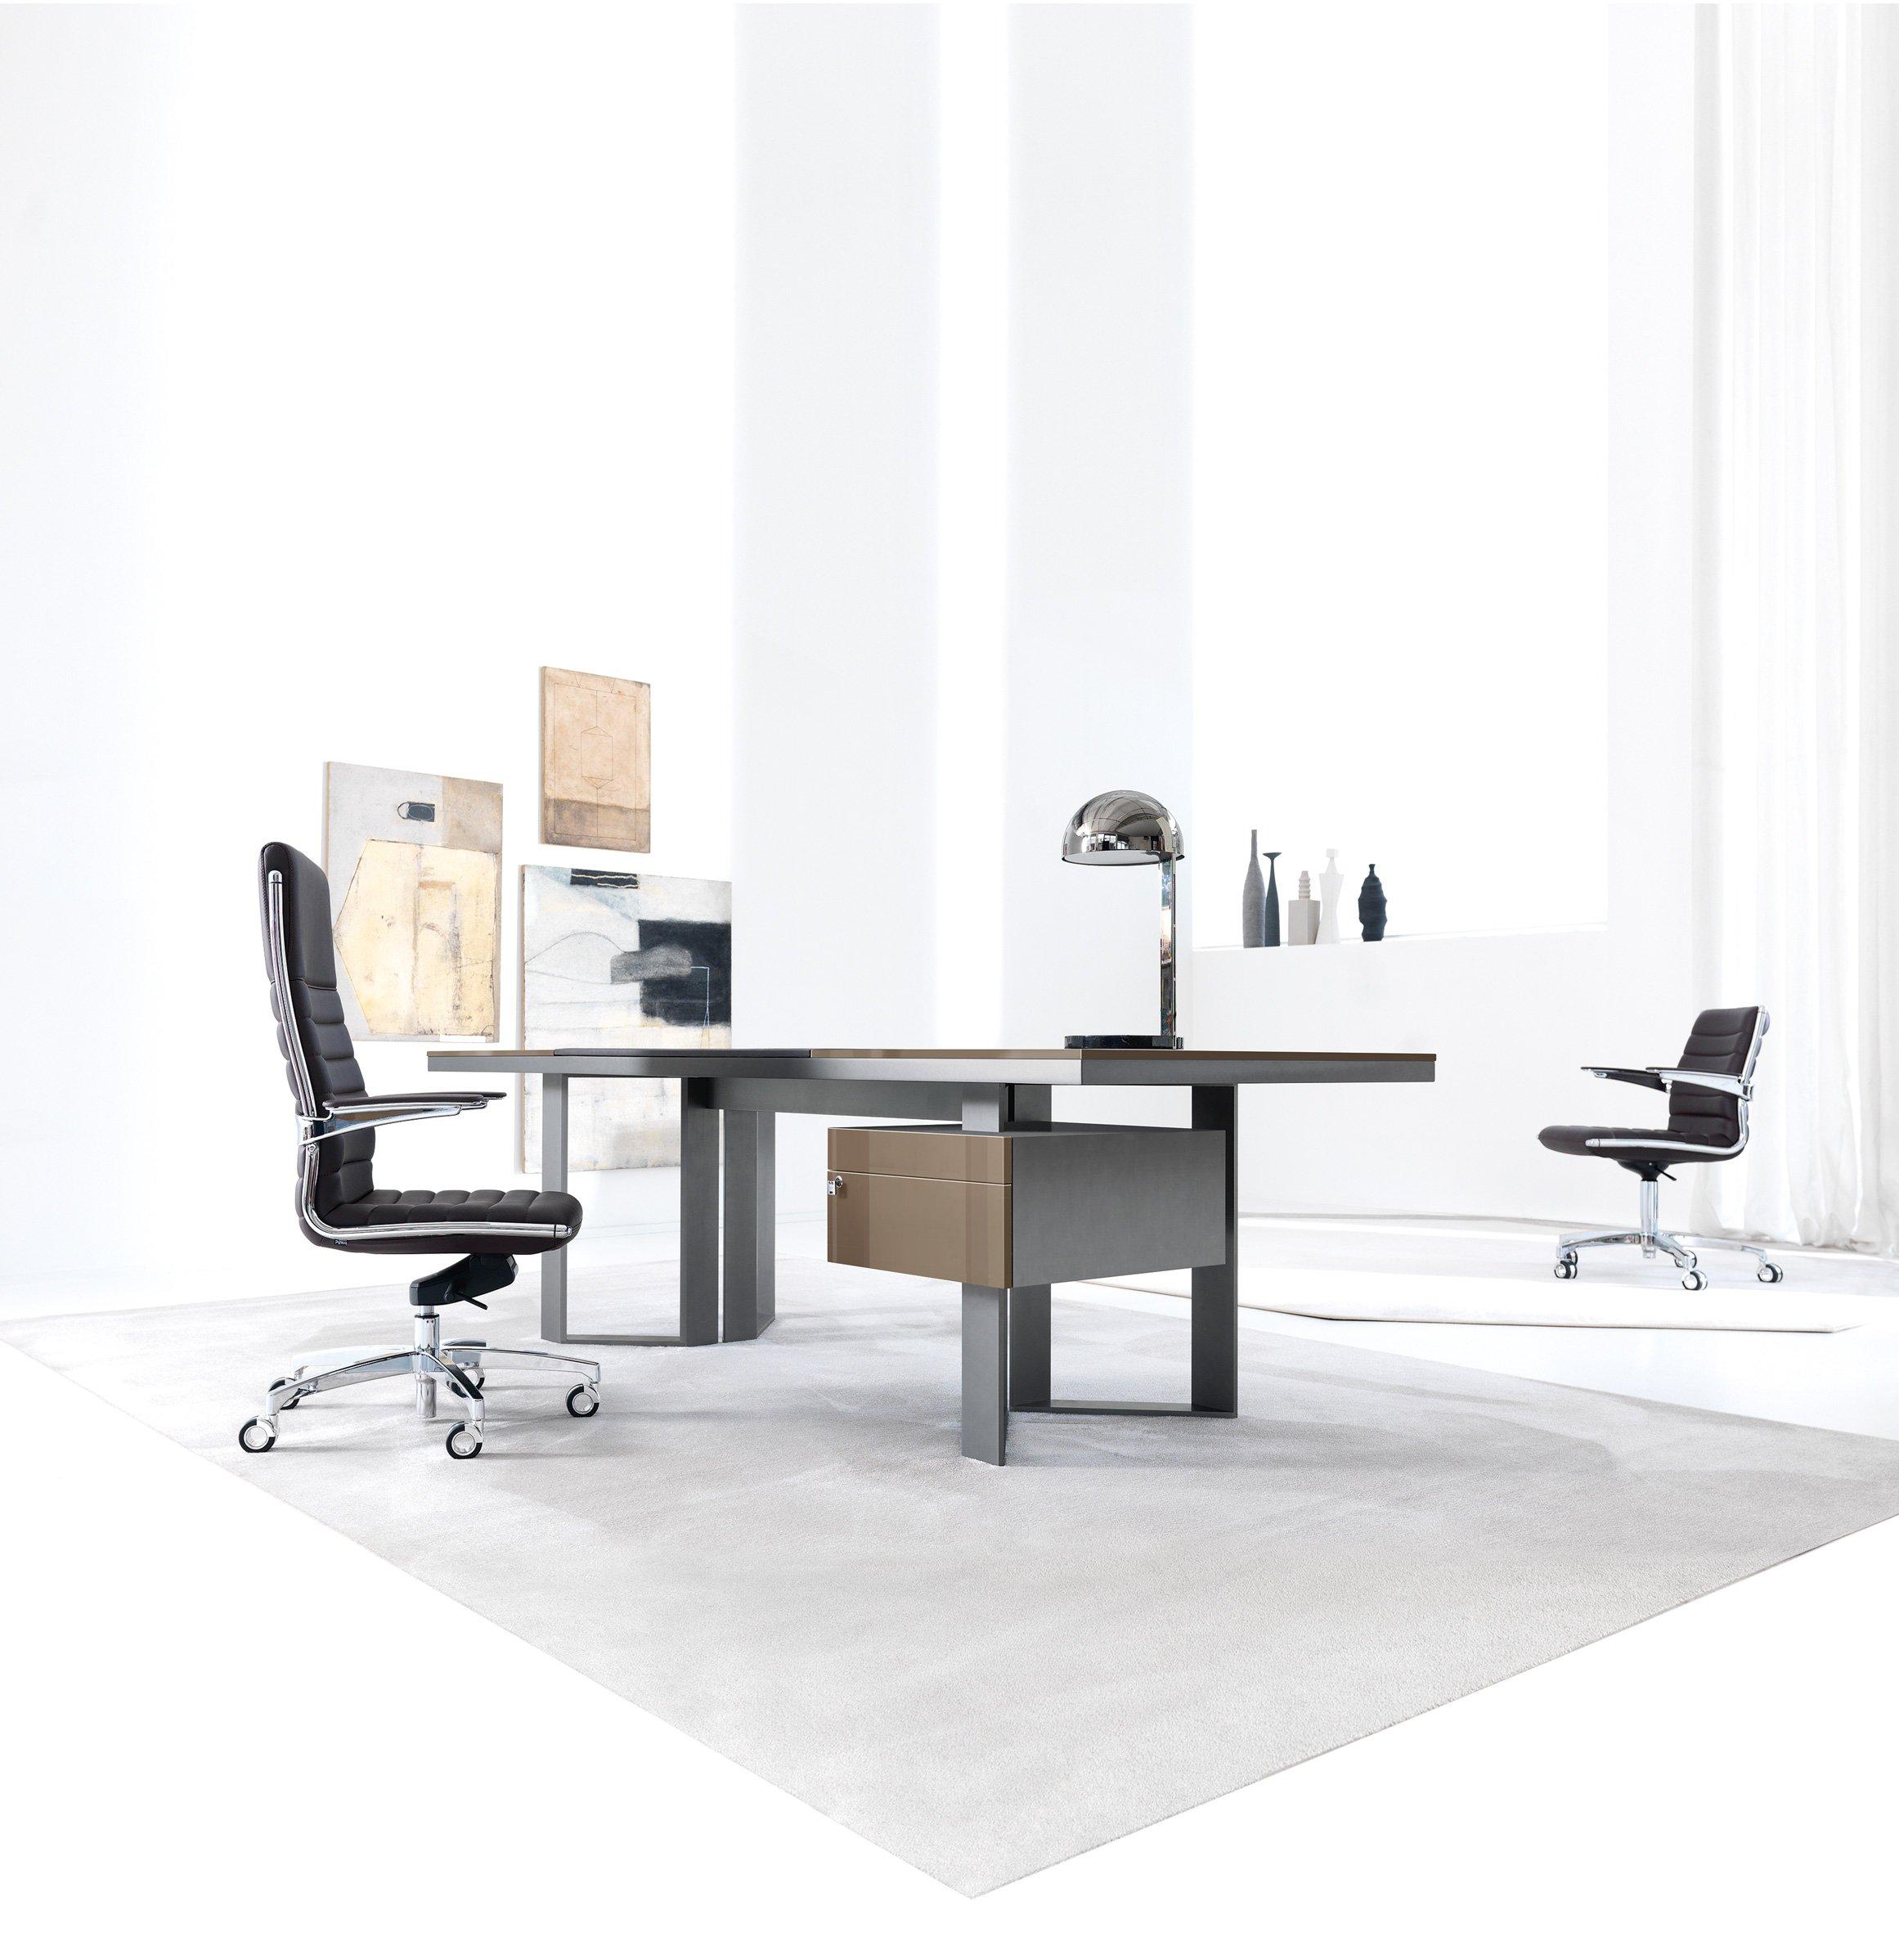 mobilier de bureau lloyd mobilier de bureau. Black Bedroom Furniture Sets. Home Design Ideas